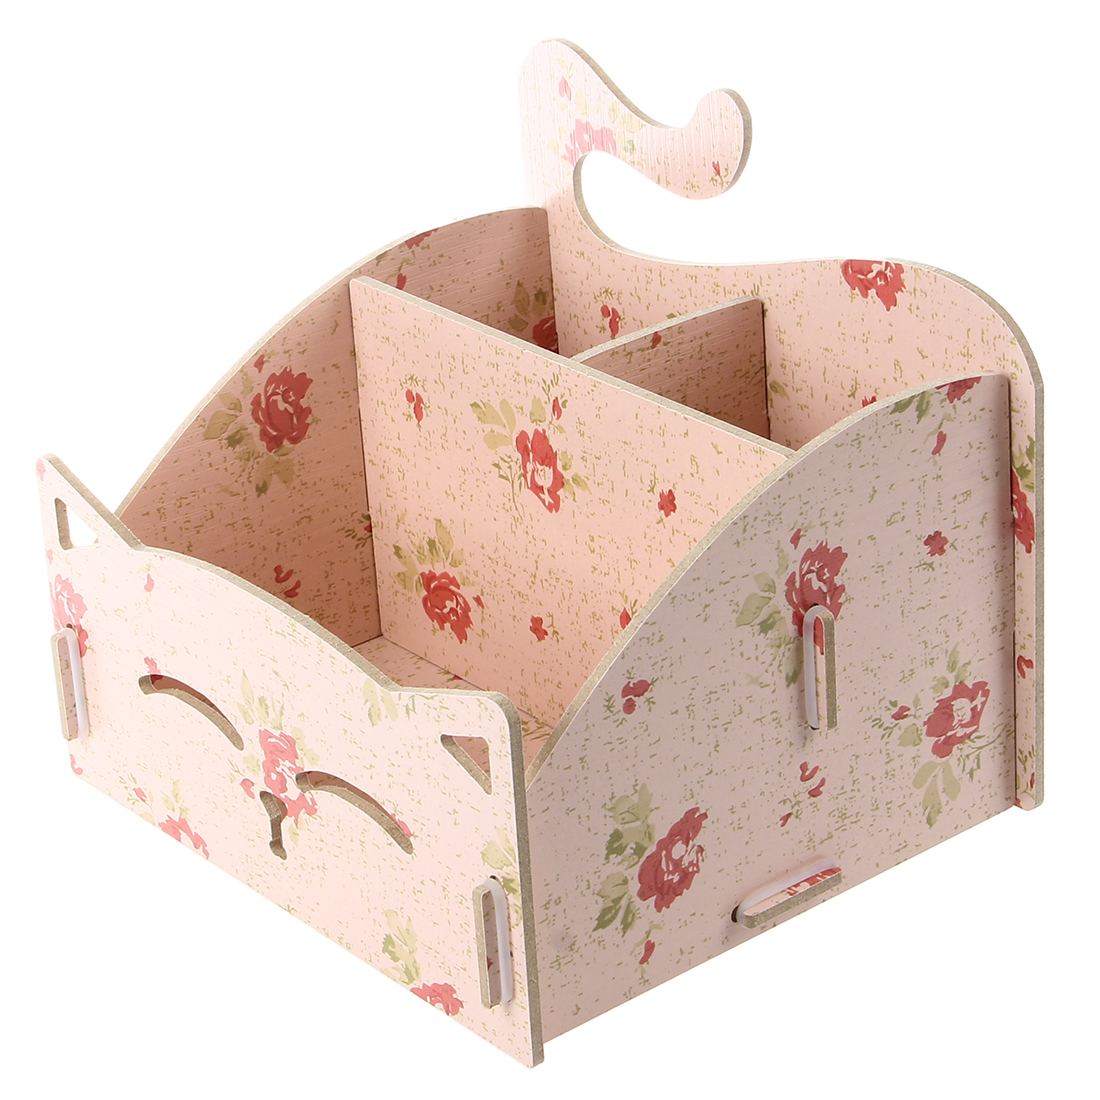 Aliexpress.com : Buy Wooden Box Cute Cat Pen Box Desktop Storage ...